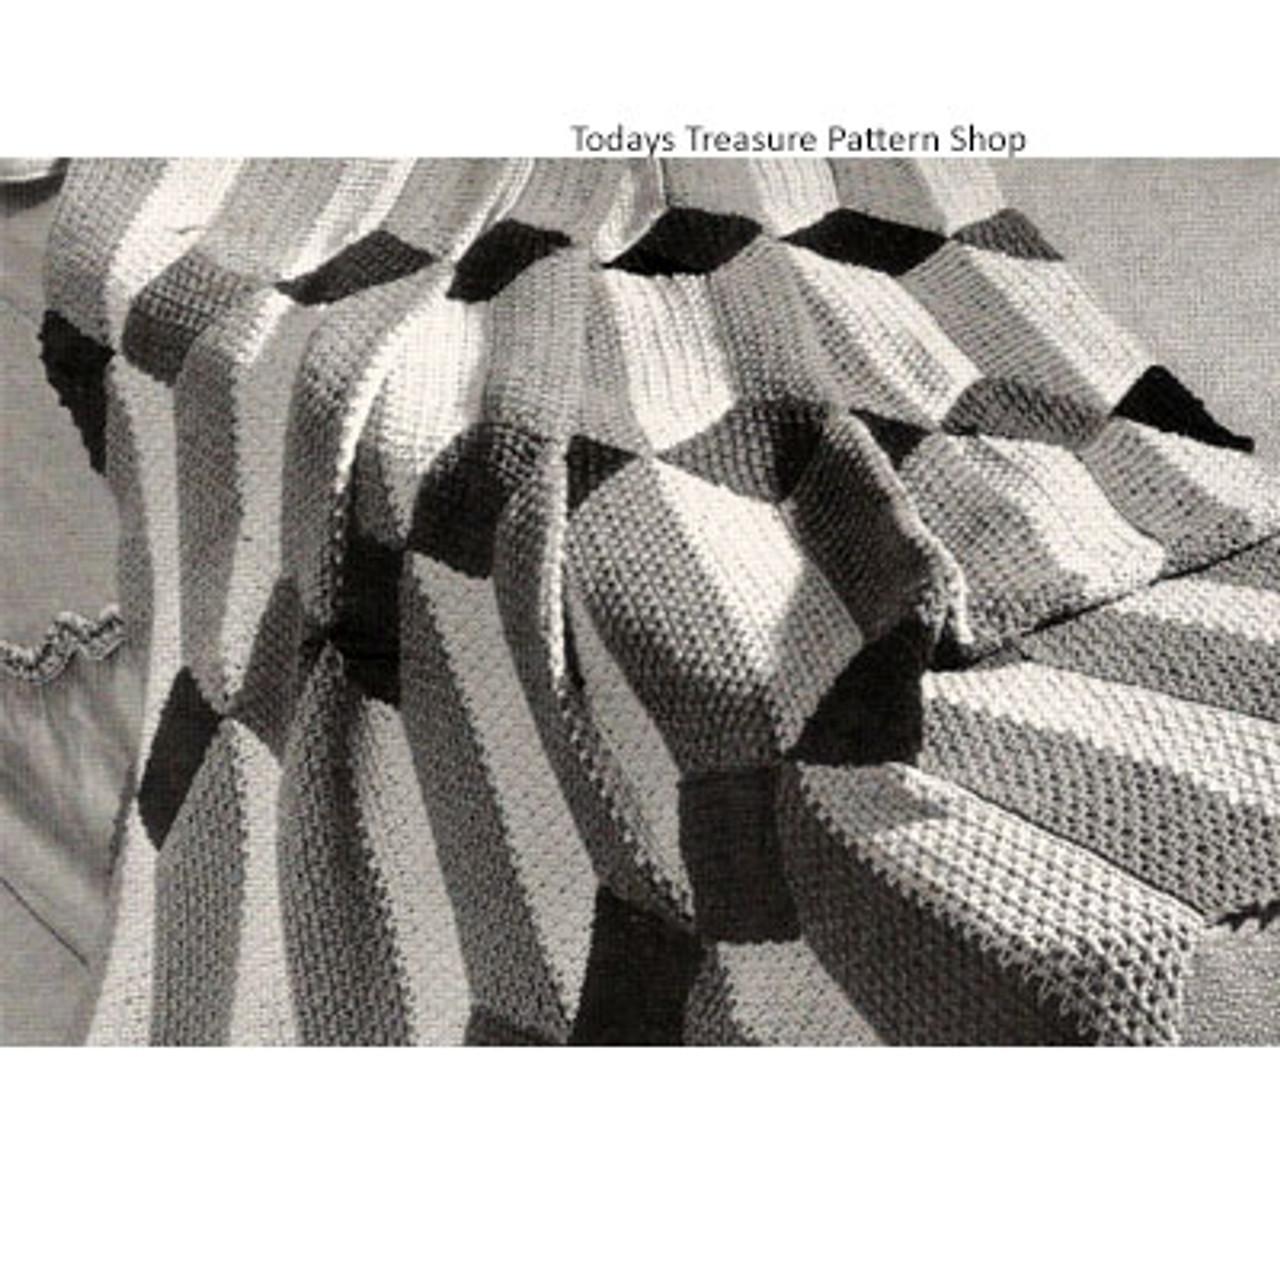 Geometric Panel Crochet Afghan Pattern